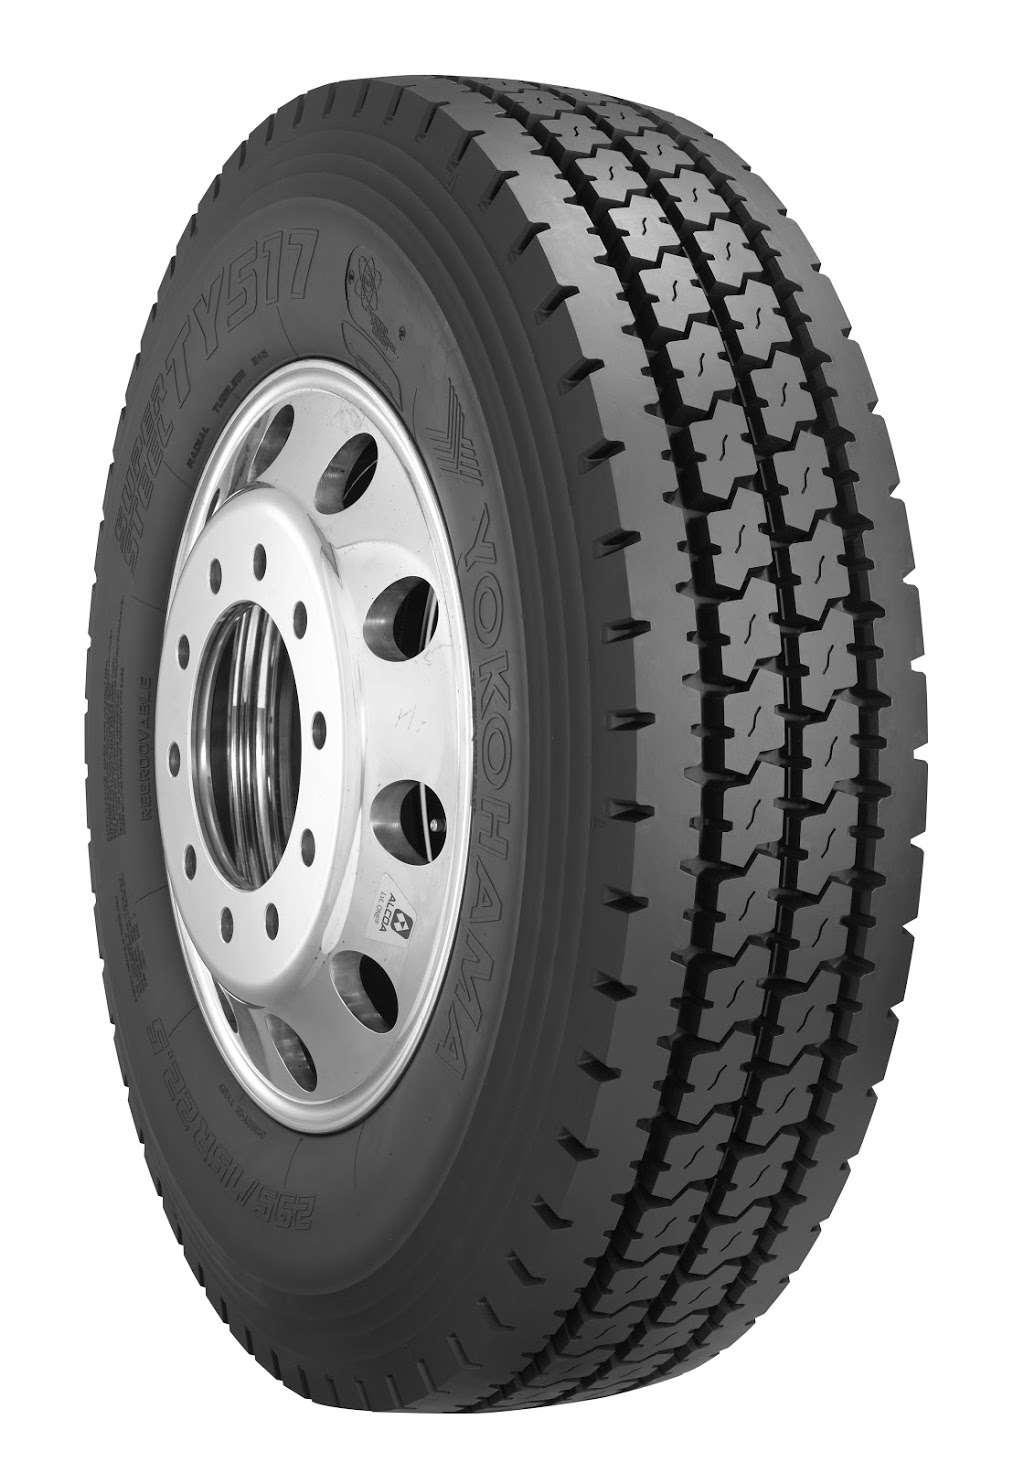 AltaTire, YOKOHAMA Commercial Tire Dealer - Roadside Semi Truck  - car repair  | Photo 6 of 10 | Address: 3123 US-175 Frontage Rd, Seagoville, TX 75159, USA | Phone: (888) 788-9643